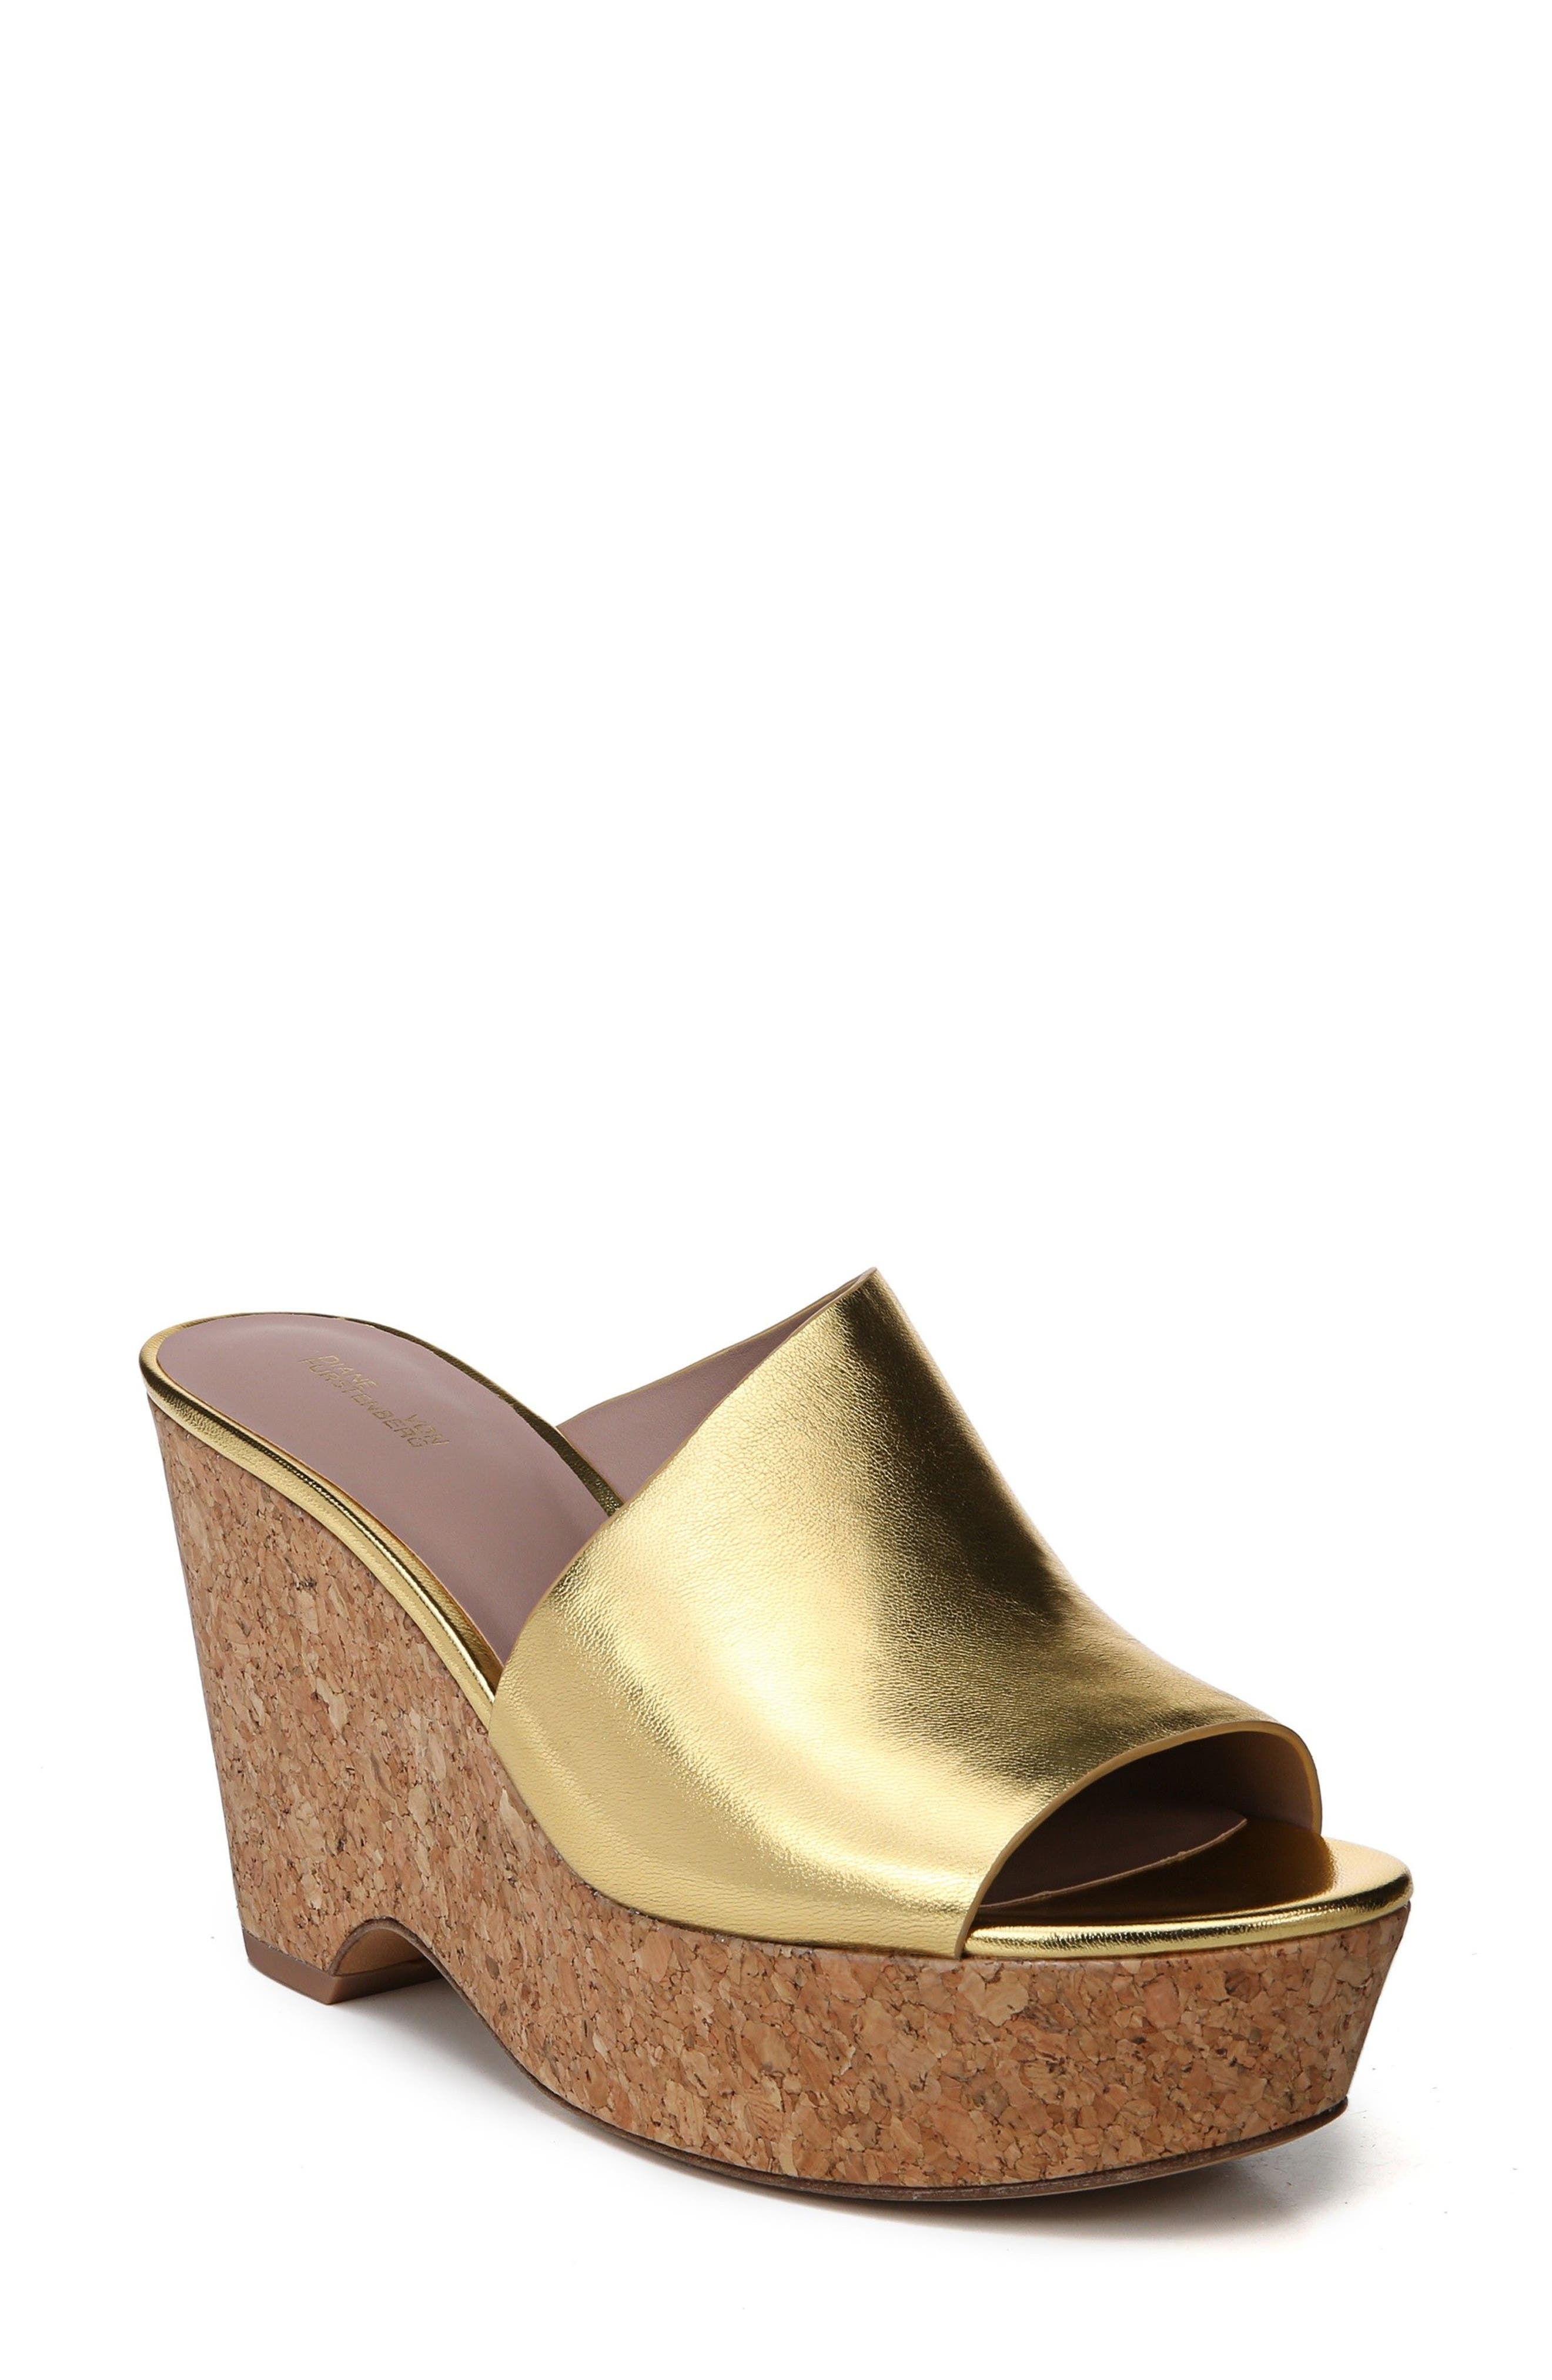 Bonnie Wedge Slide Sandal,                         Main,                         color, Gold